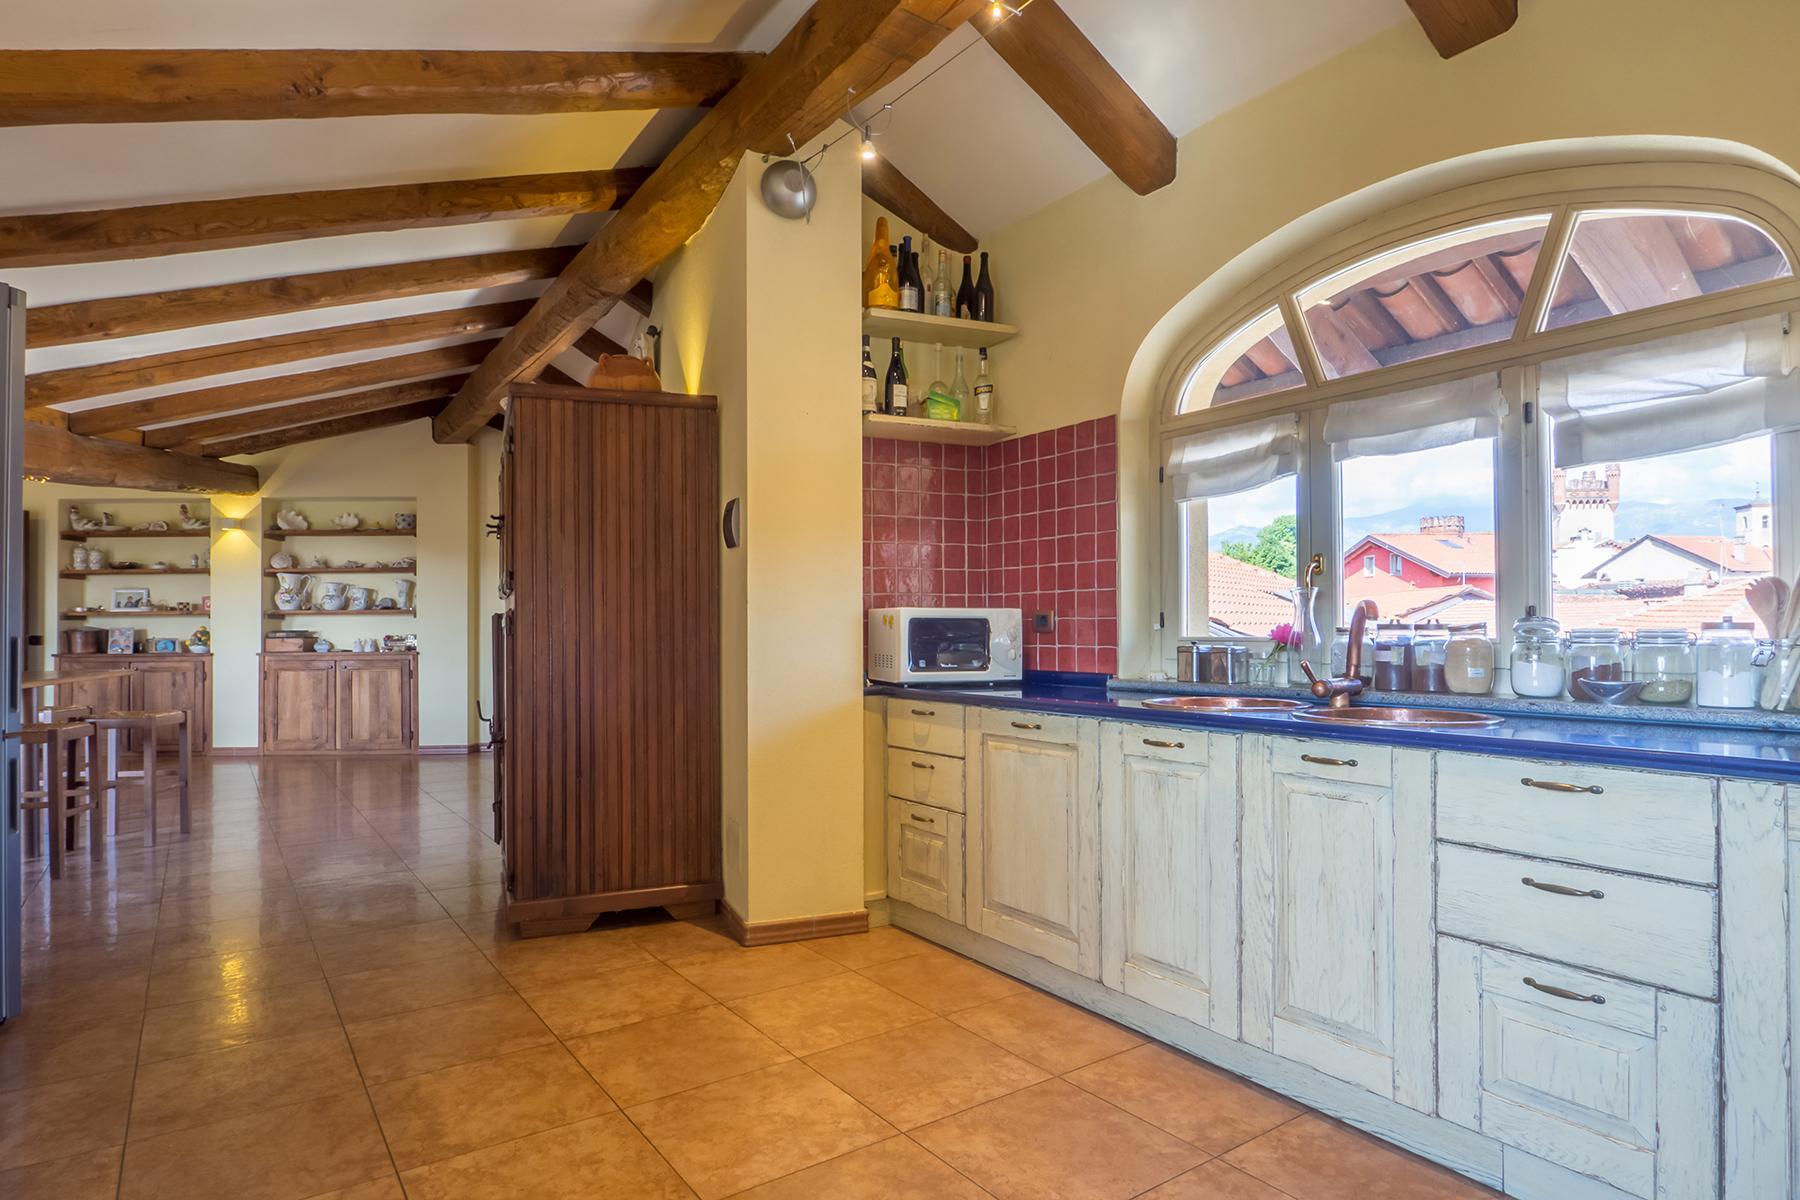 Elegant apartment in the Canavese region - 9